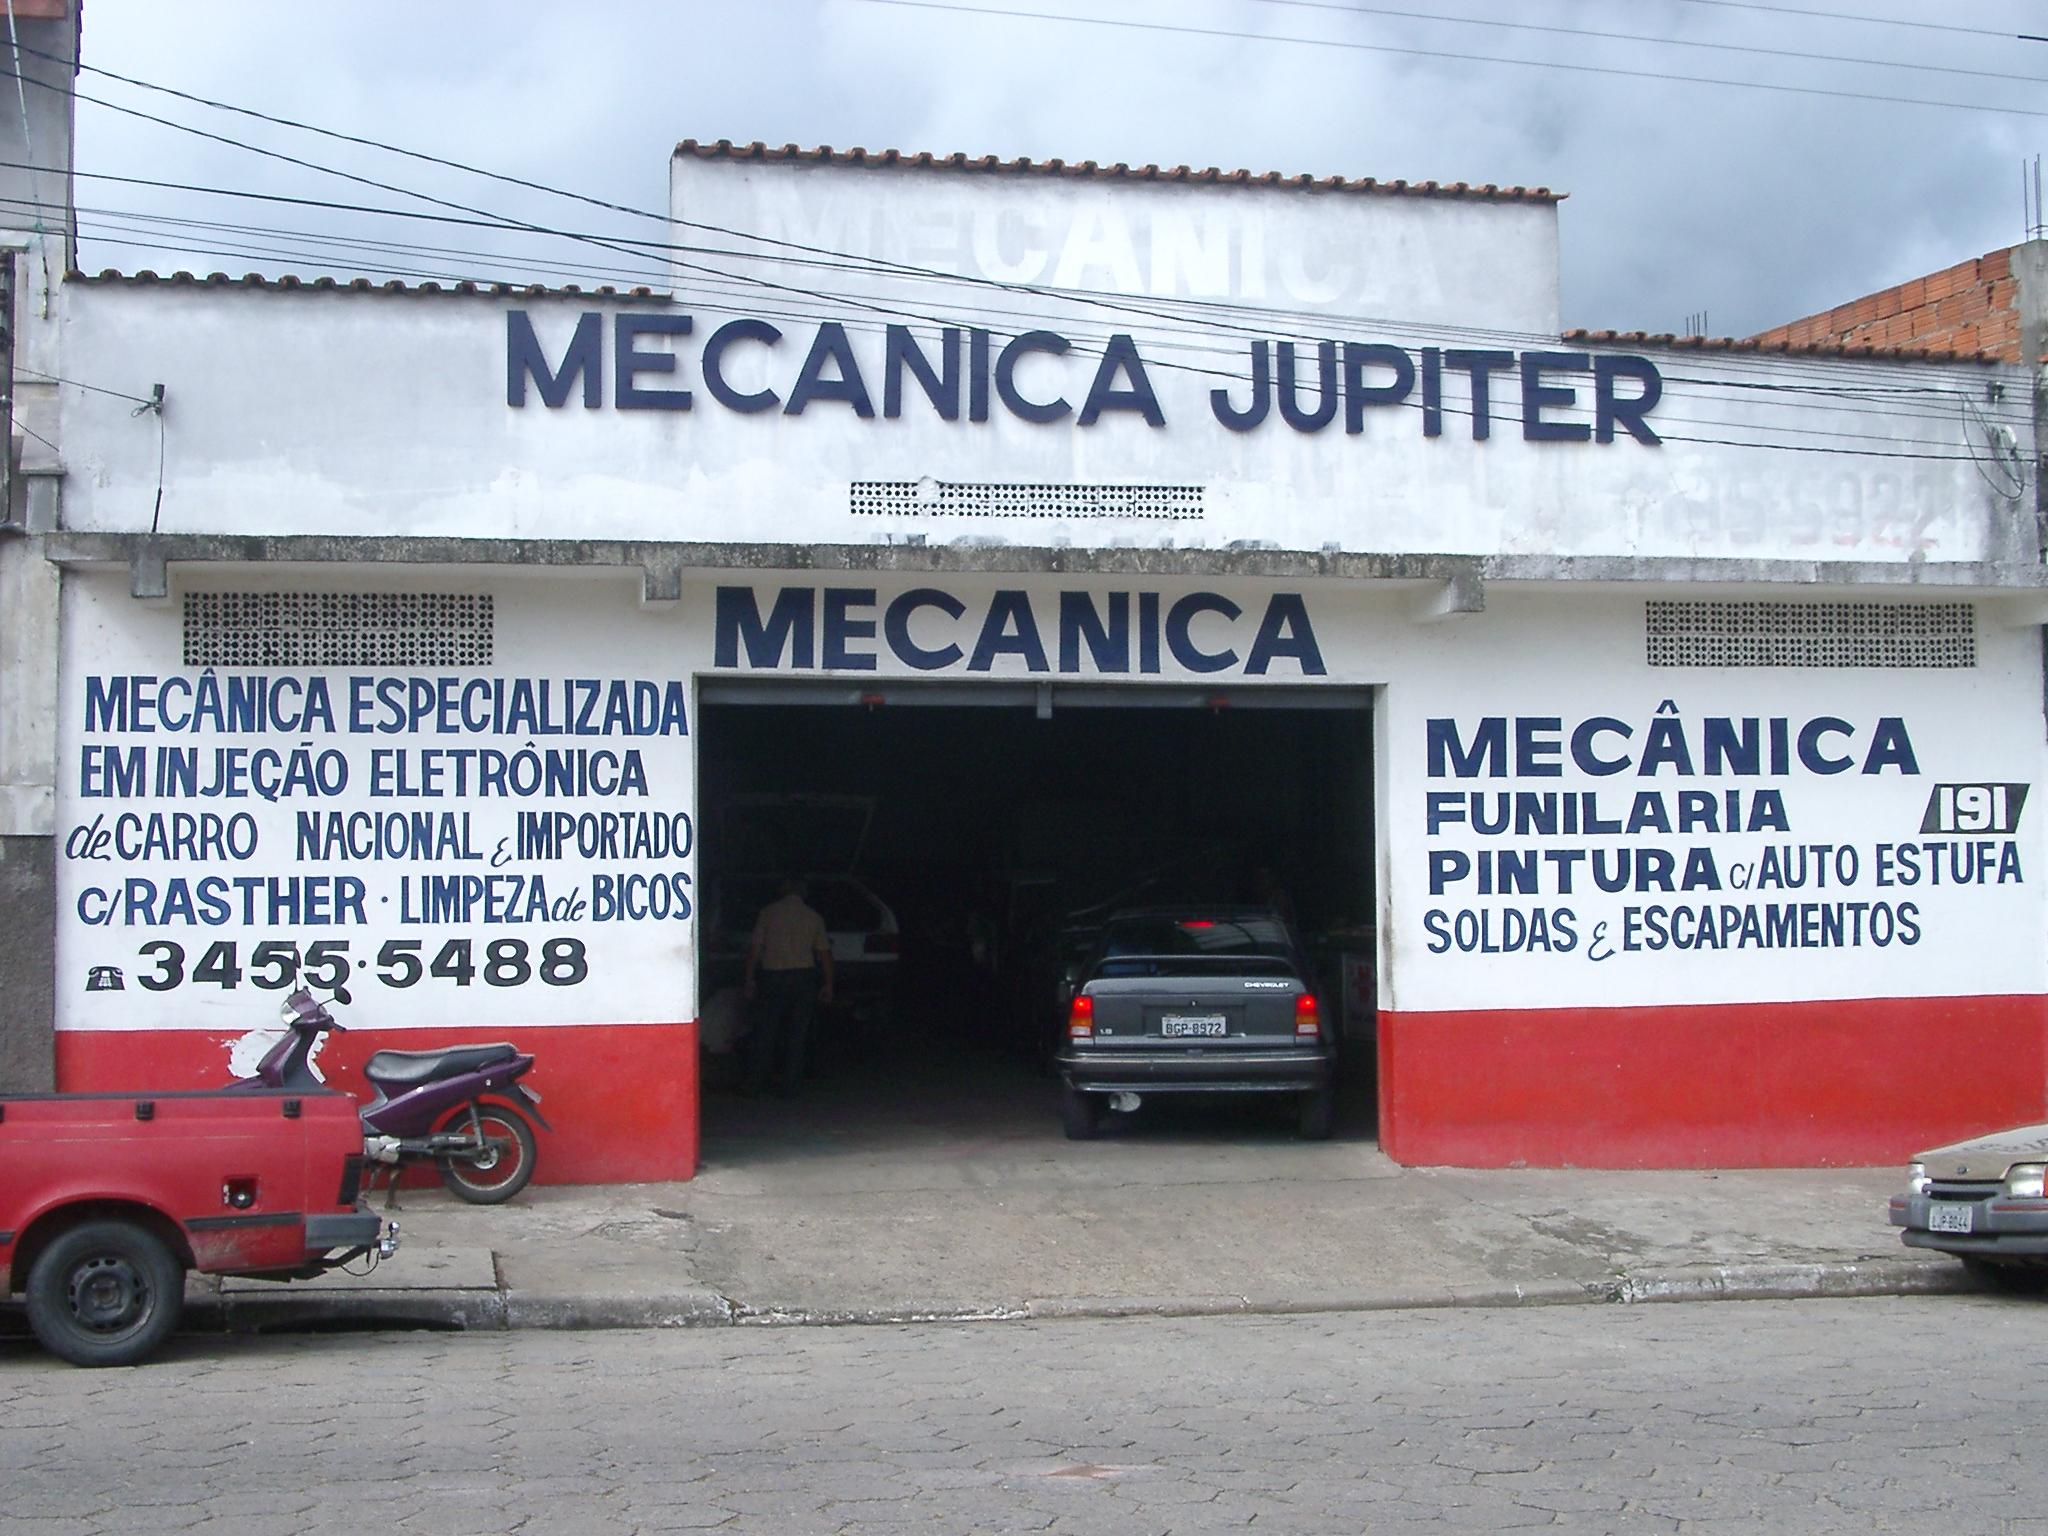 Mecanica Jupiter, Peruibe.JPG